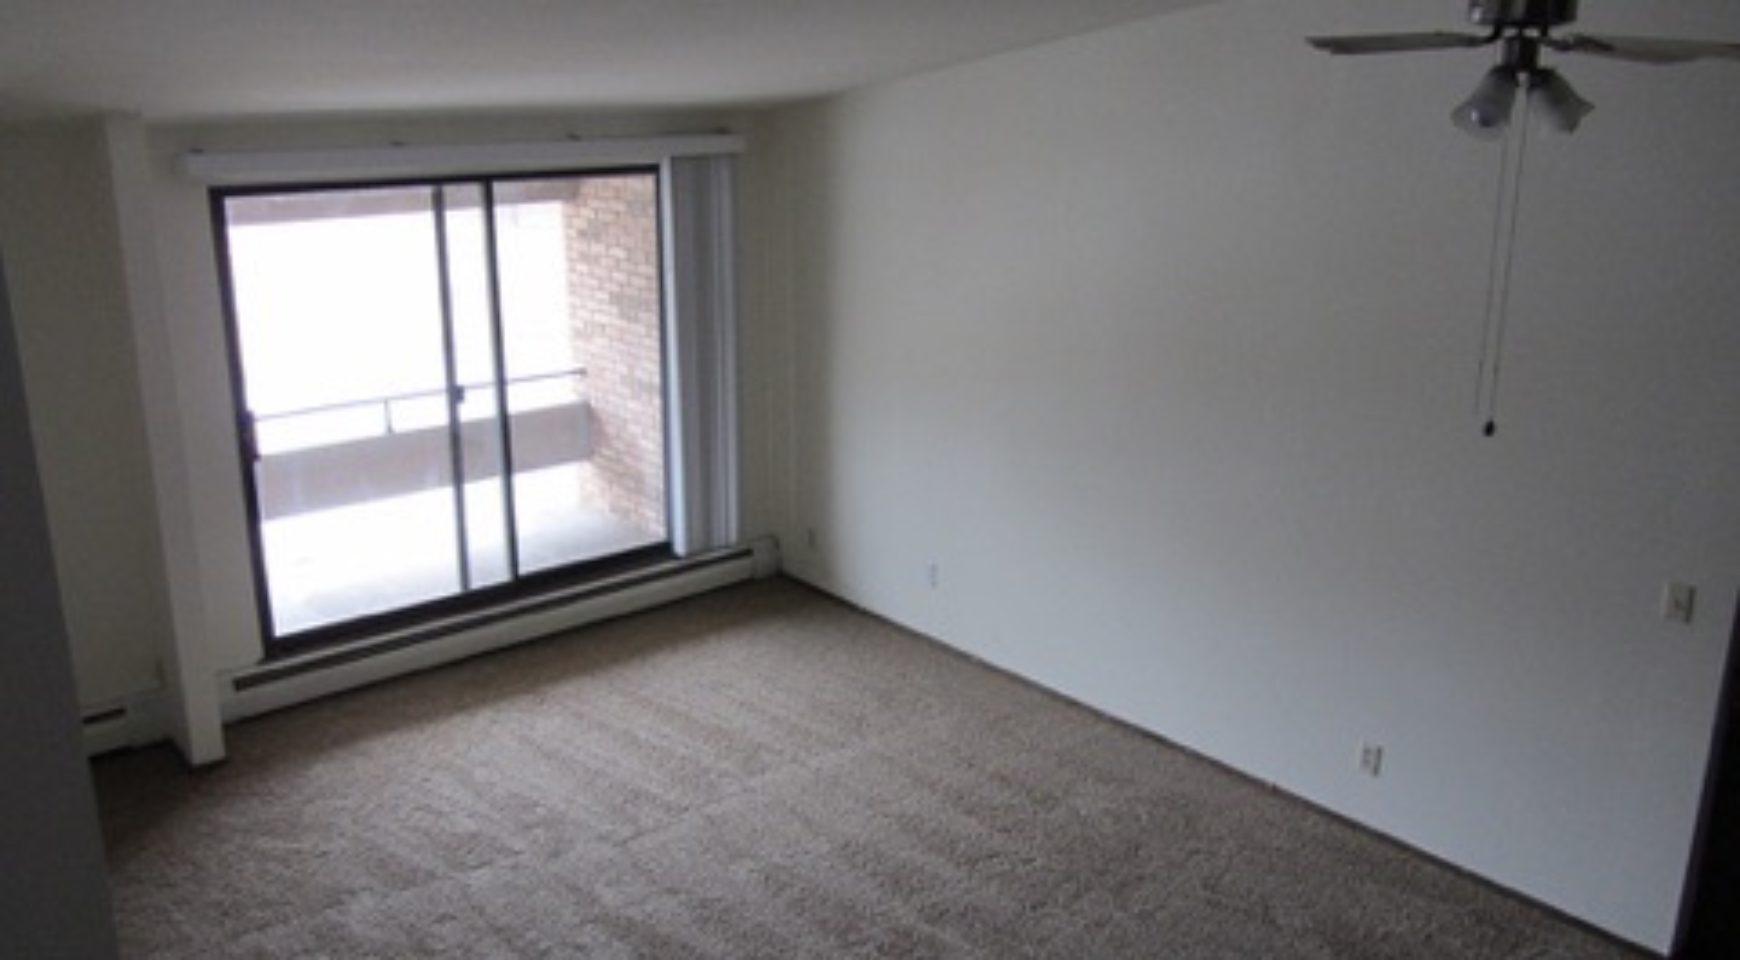 1 Bedroom Apartments Boone Nc | Kh Design Inside 1 Bedroom ...